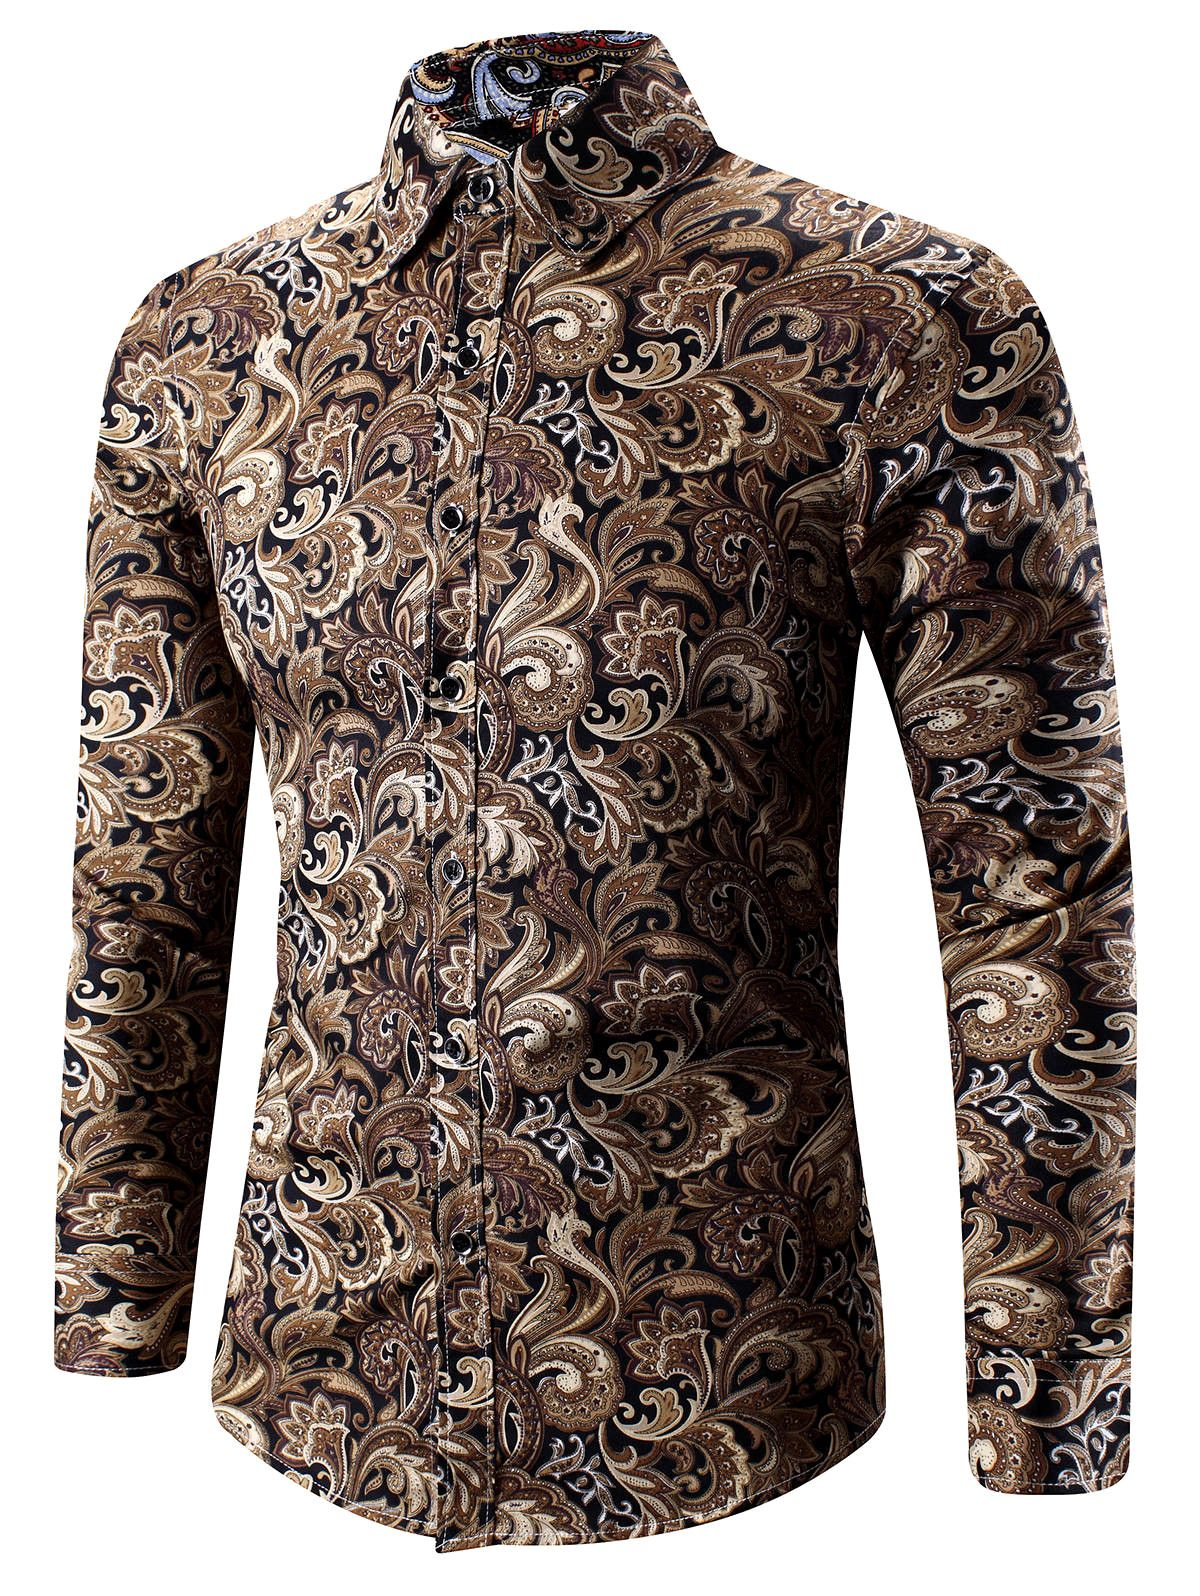 c8a54fe38c0  19.88 Turn-Down Collar 3D Paisley Print Shirt